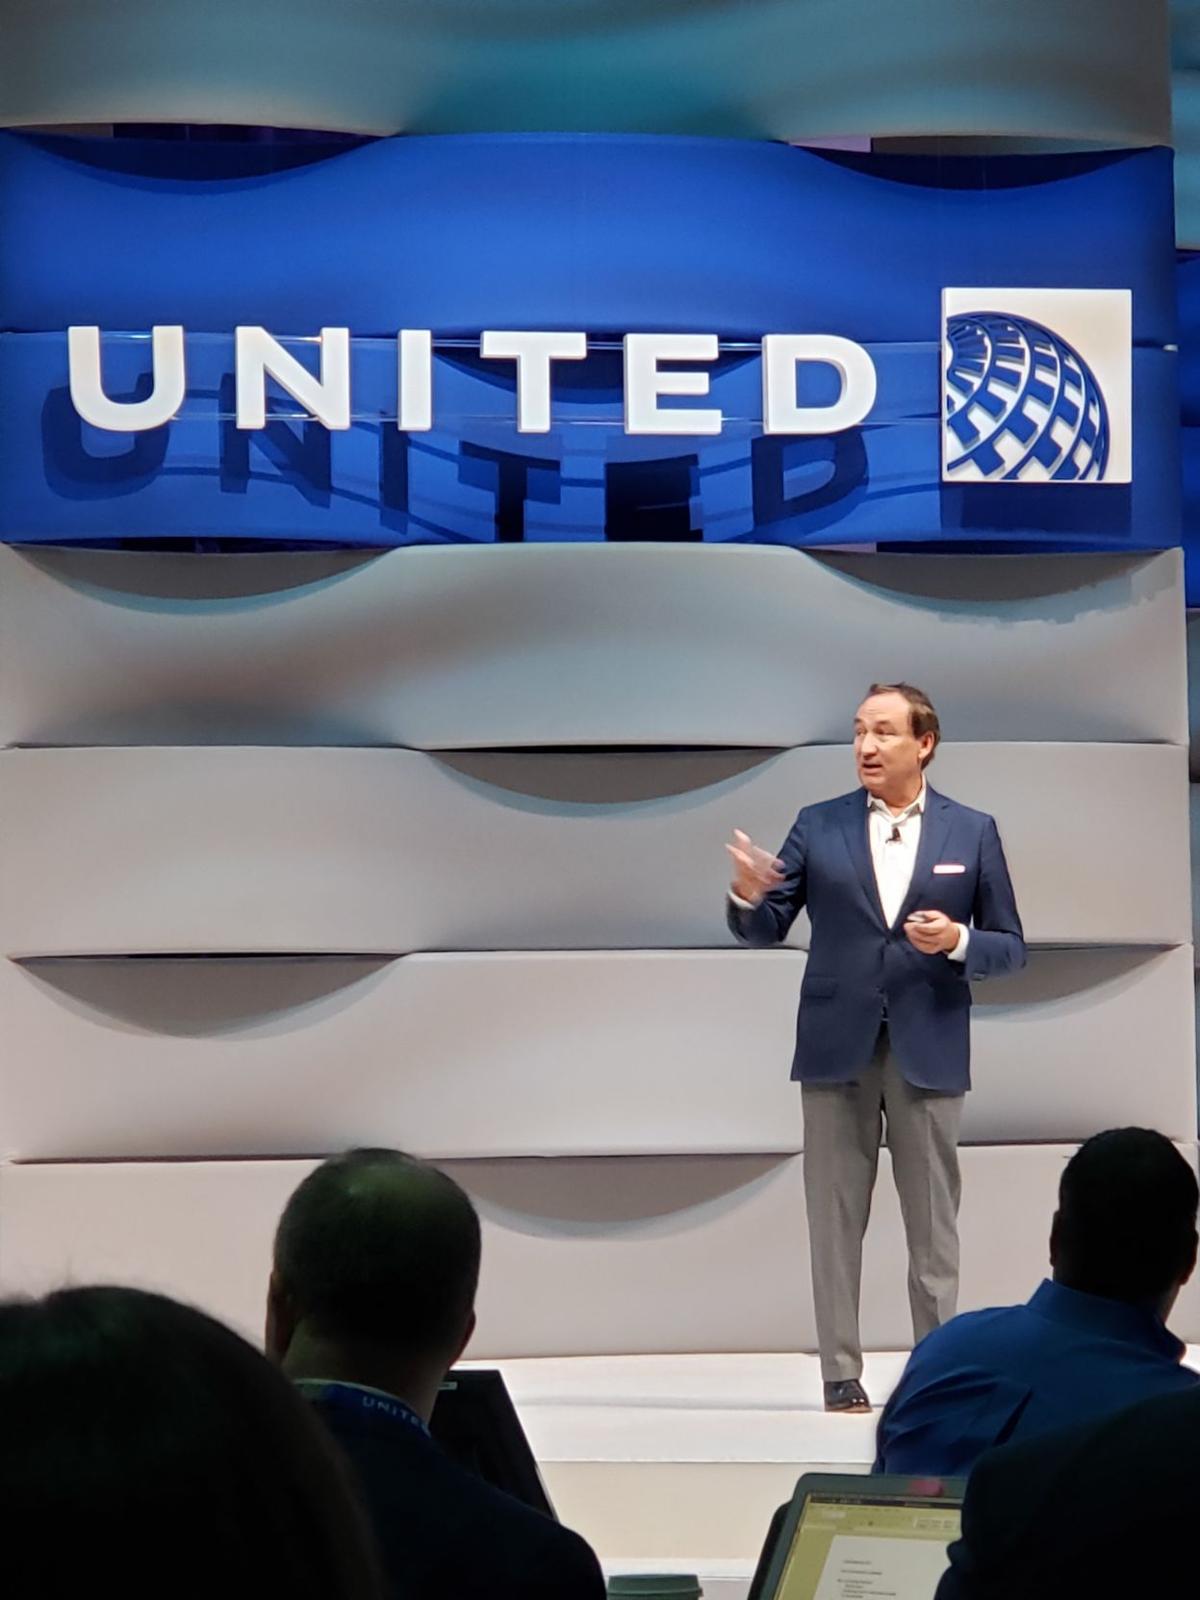 United outlines Flight Plan 2020